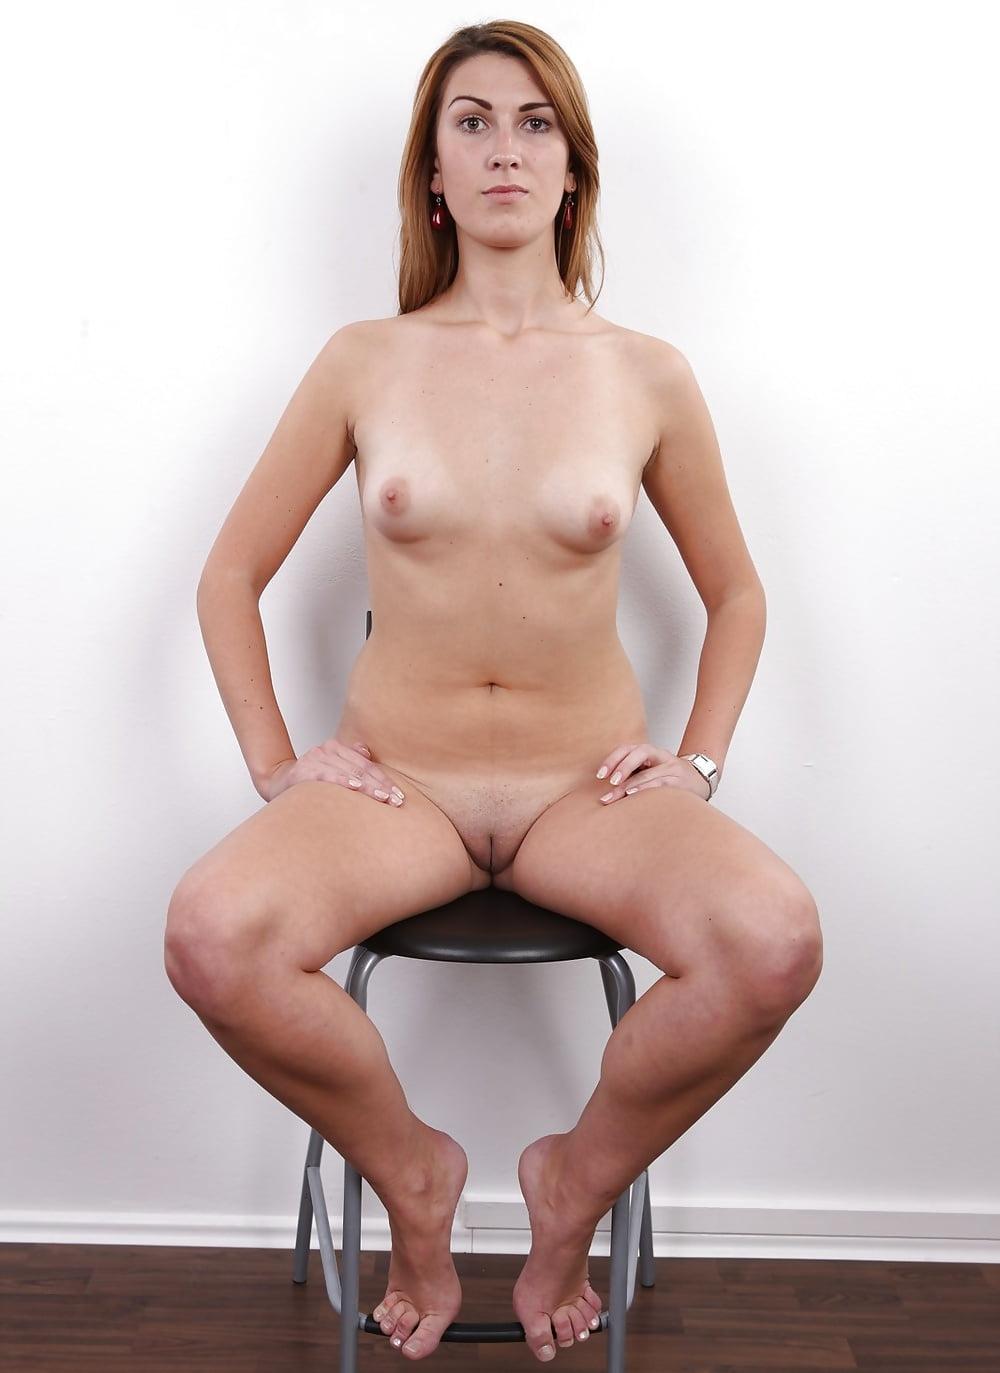 girls-masterbating-nude-czech-mom